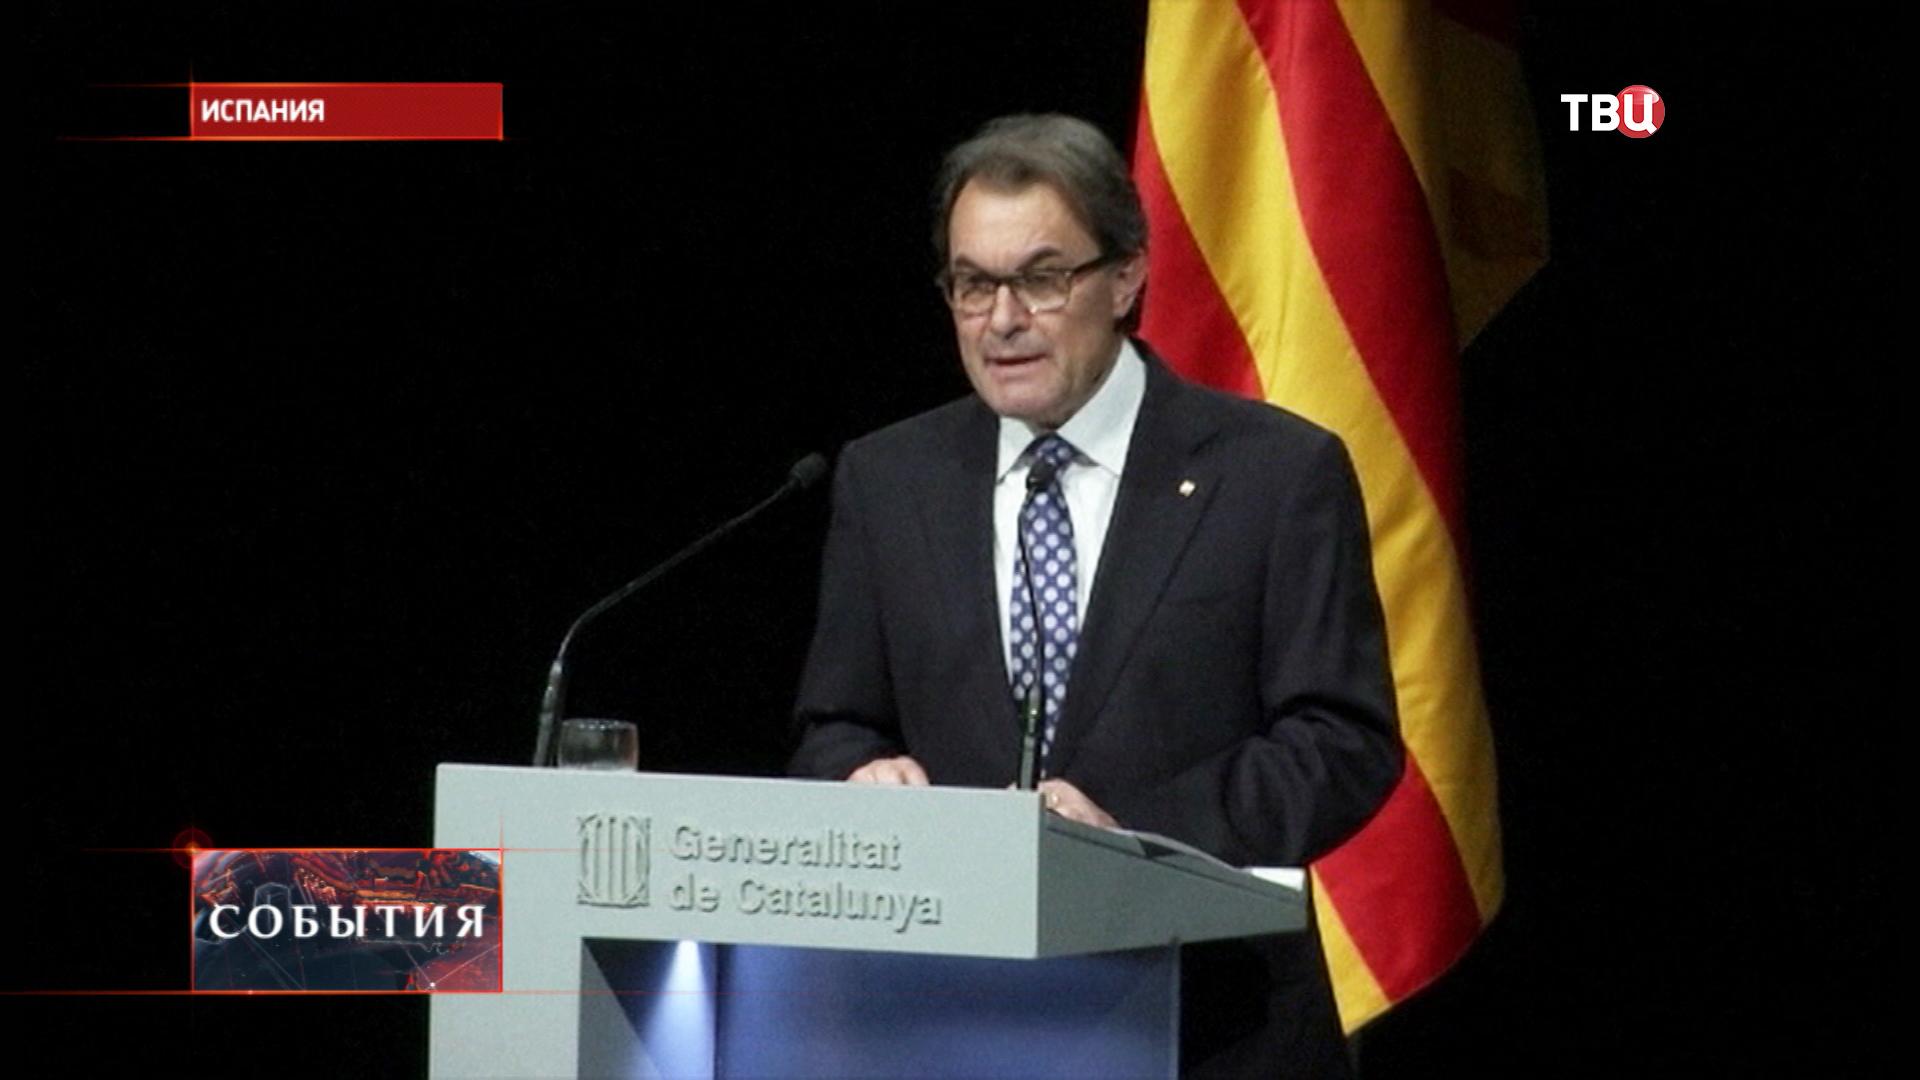 Глава Каталонии Артур Мас